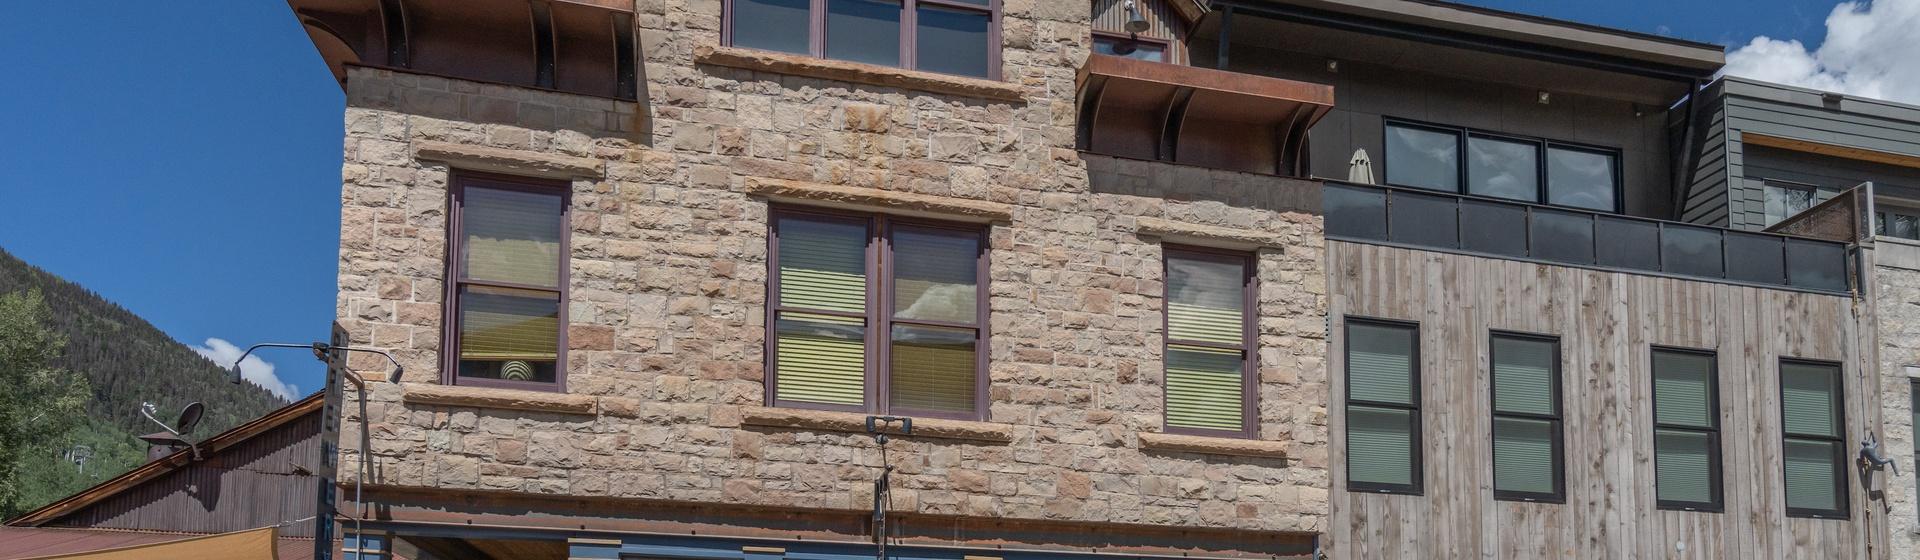 18-Telluride-Pine-Street-Penthouse-A-Exterior